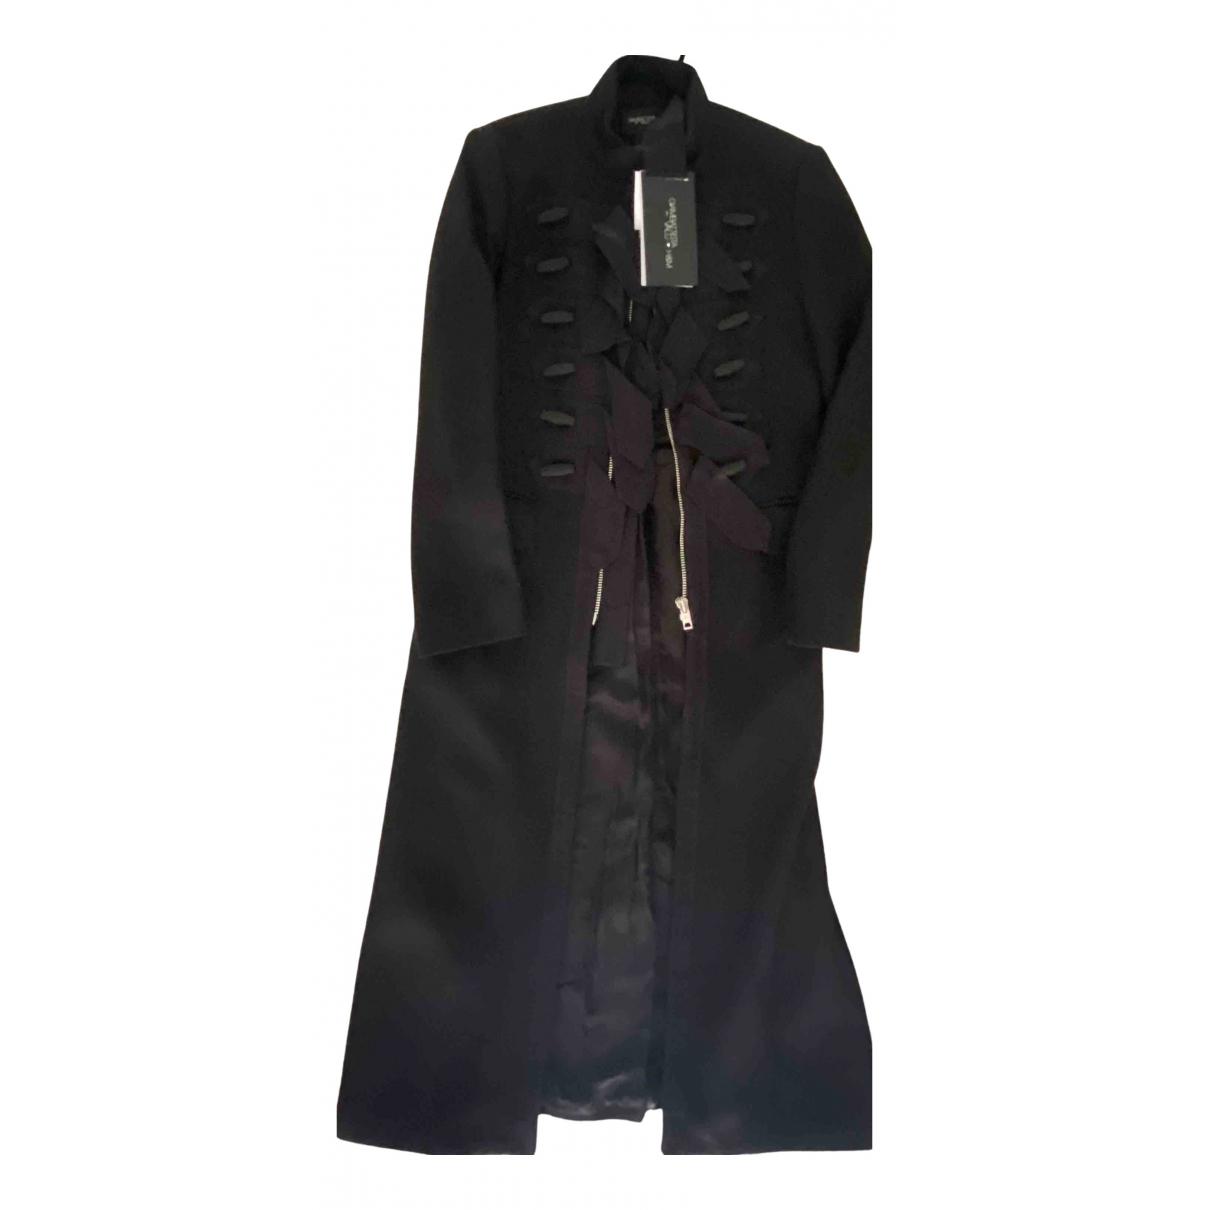 Giambattista Valli X H&m - Manteau   pour homme en toile - noir